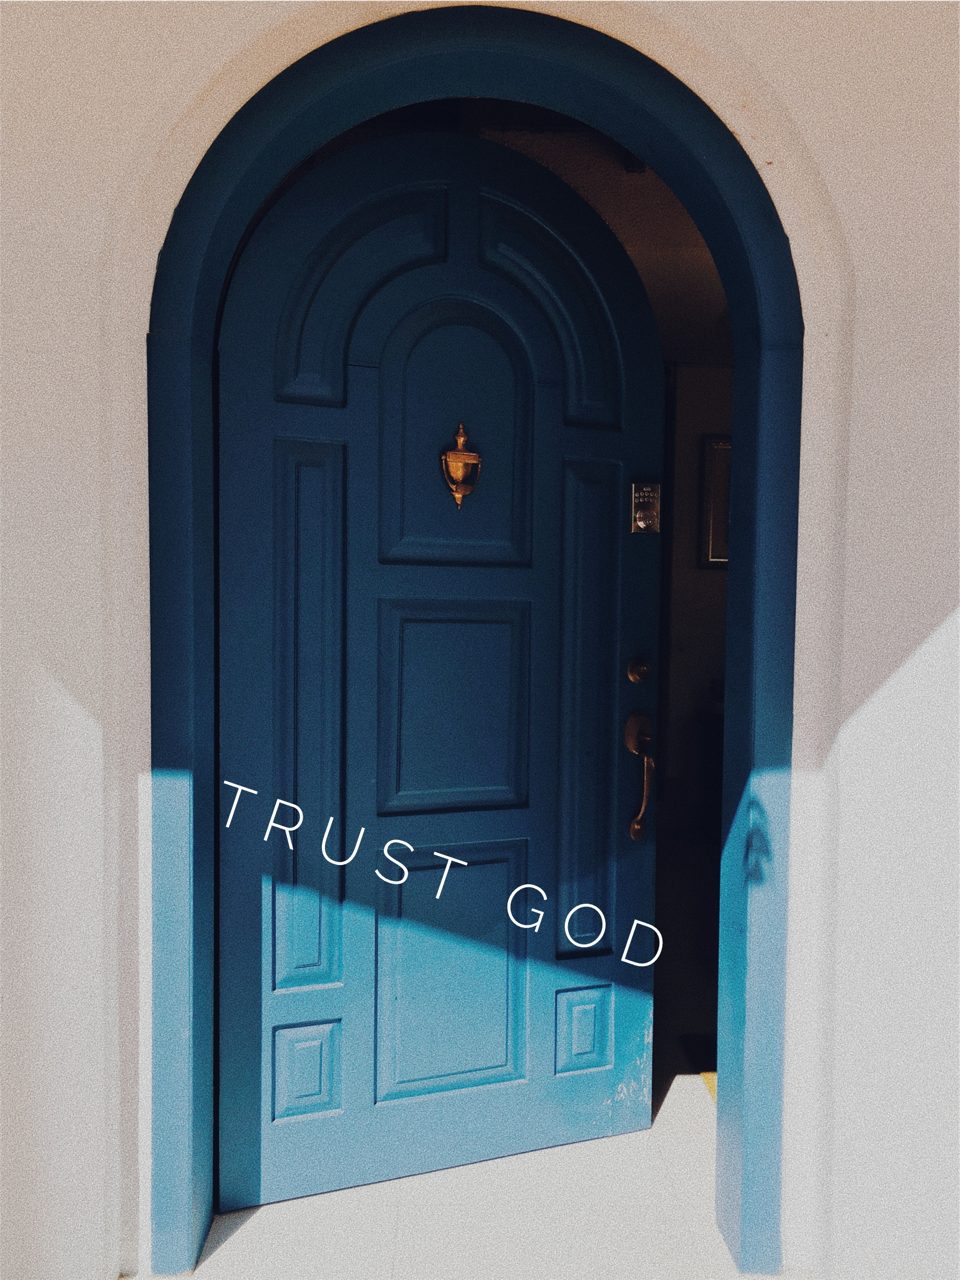 Trust God at the No's